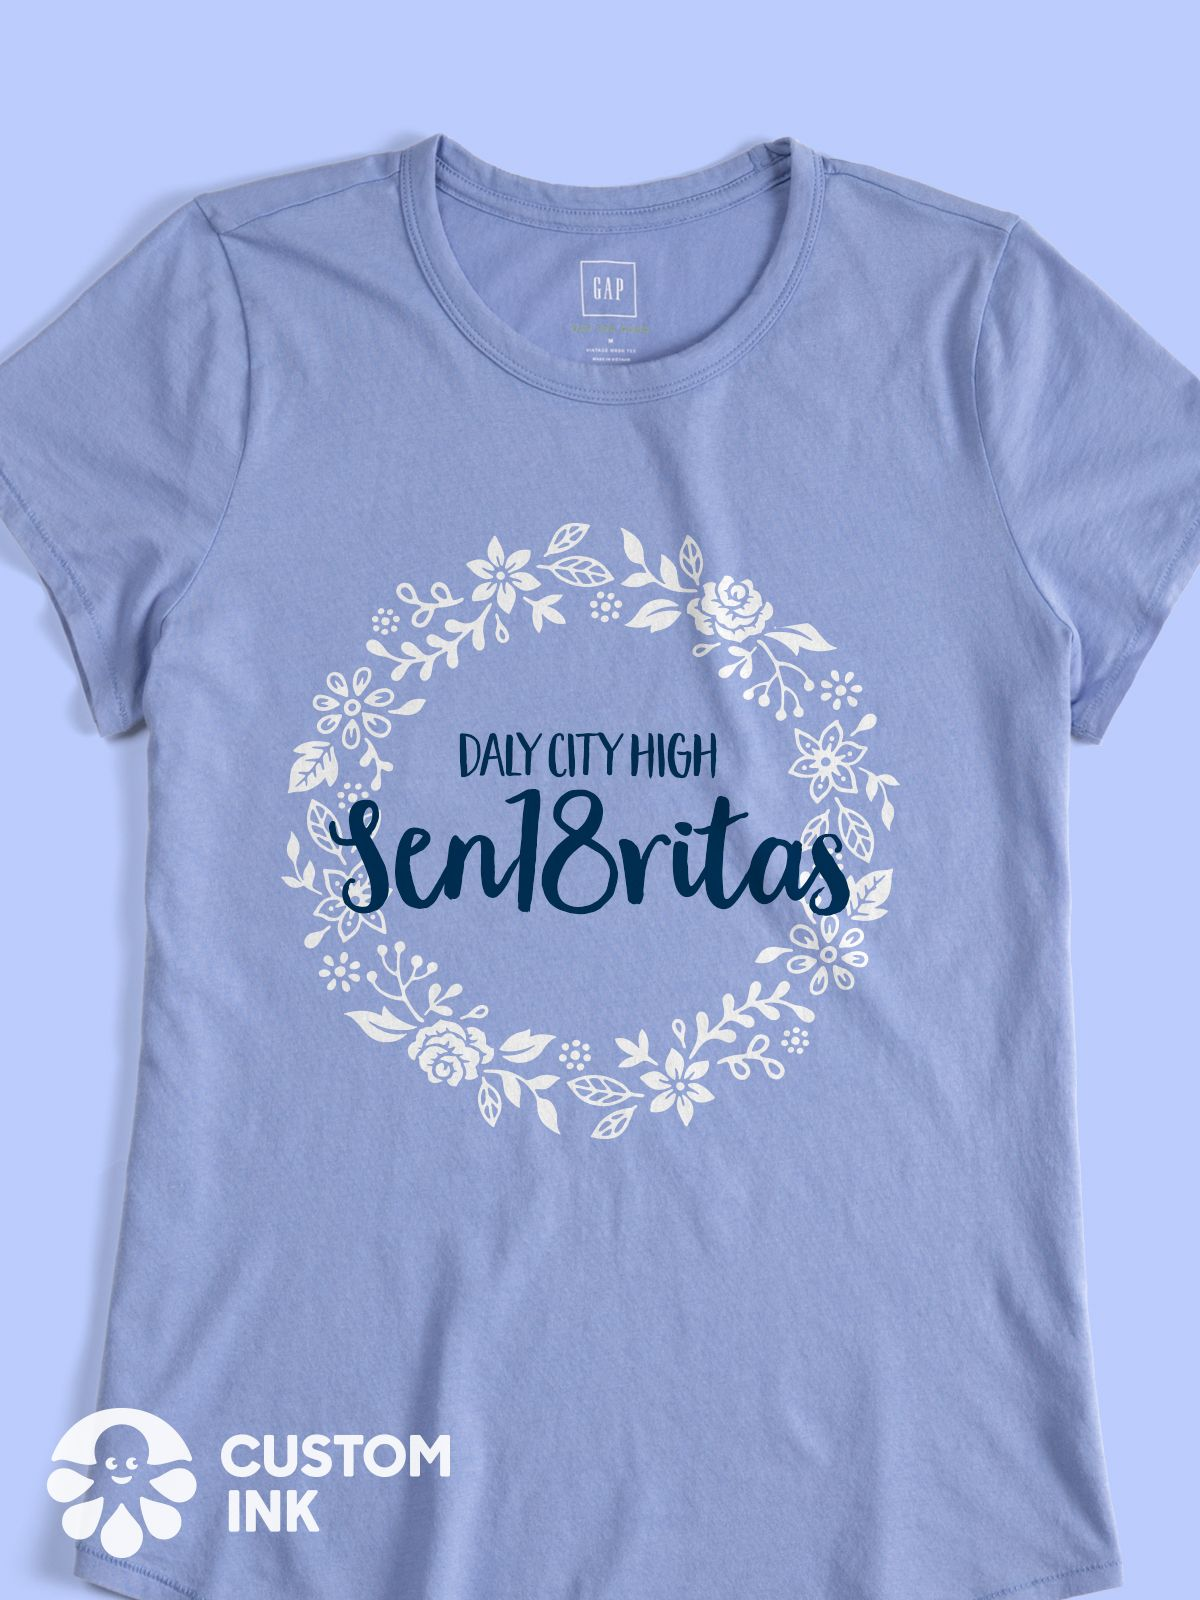 Sen18ritas Class of 2018 class shirt - design idea for custom ...